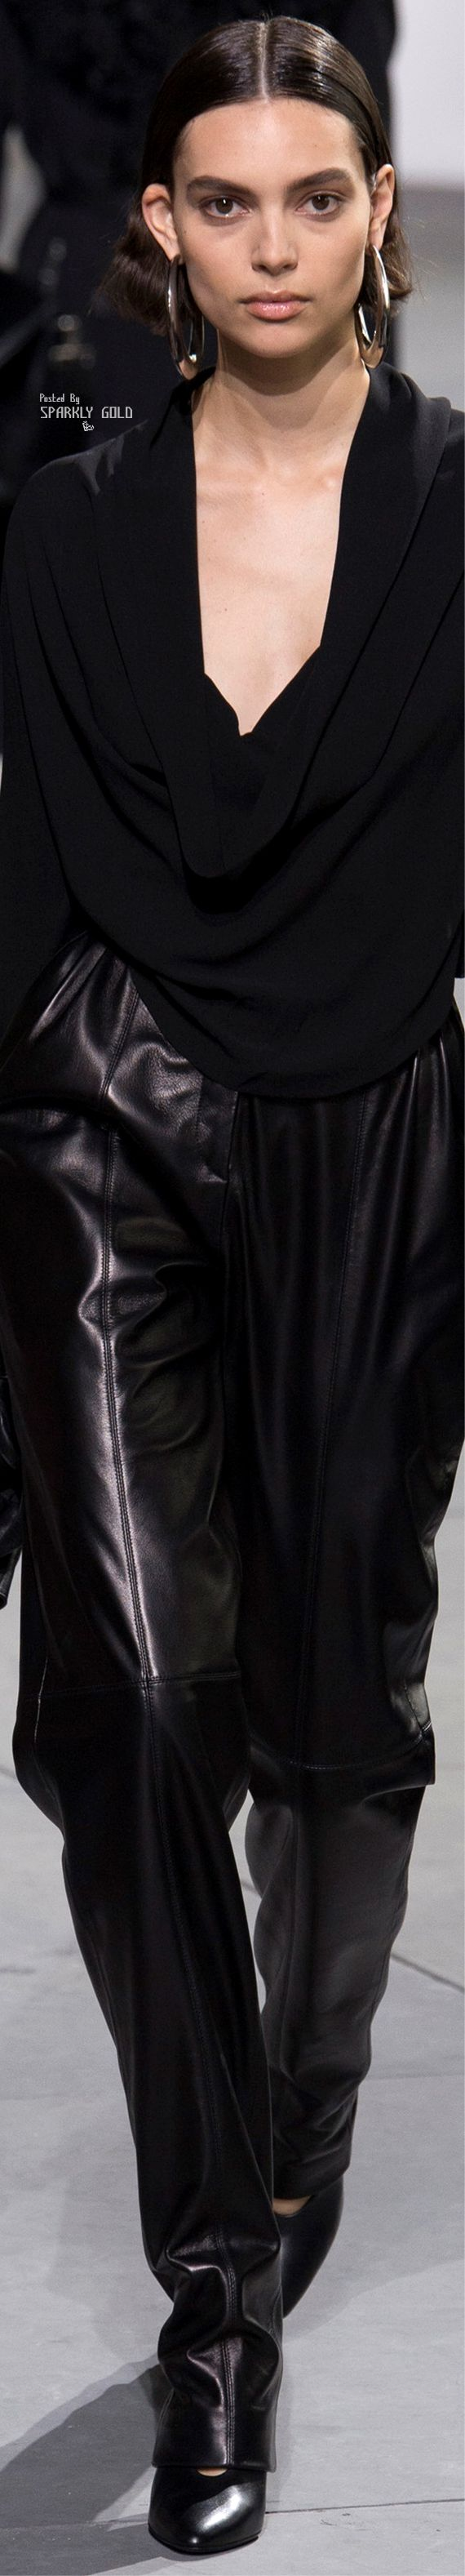 Michael Kors Fall 2017 RTW